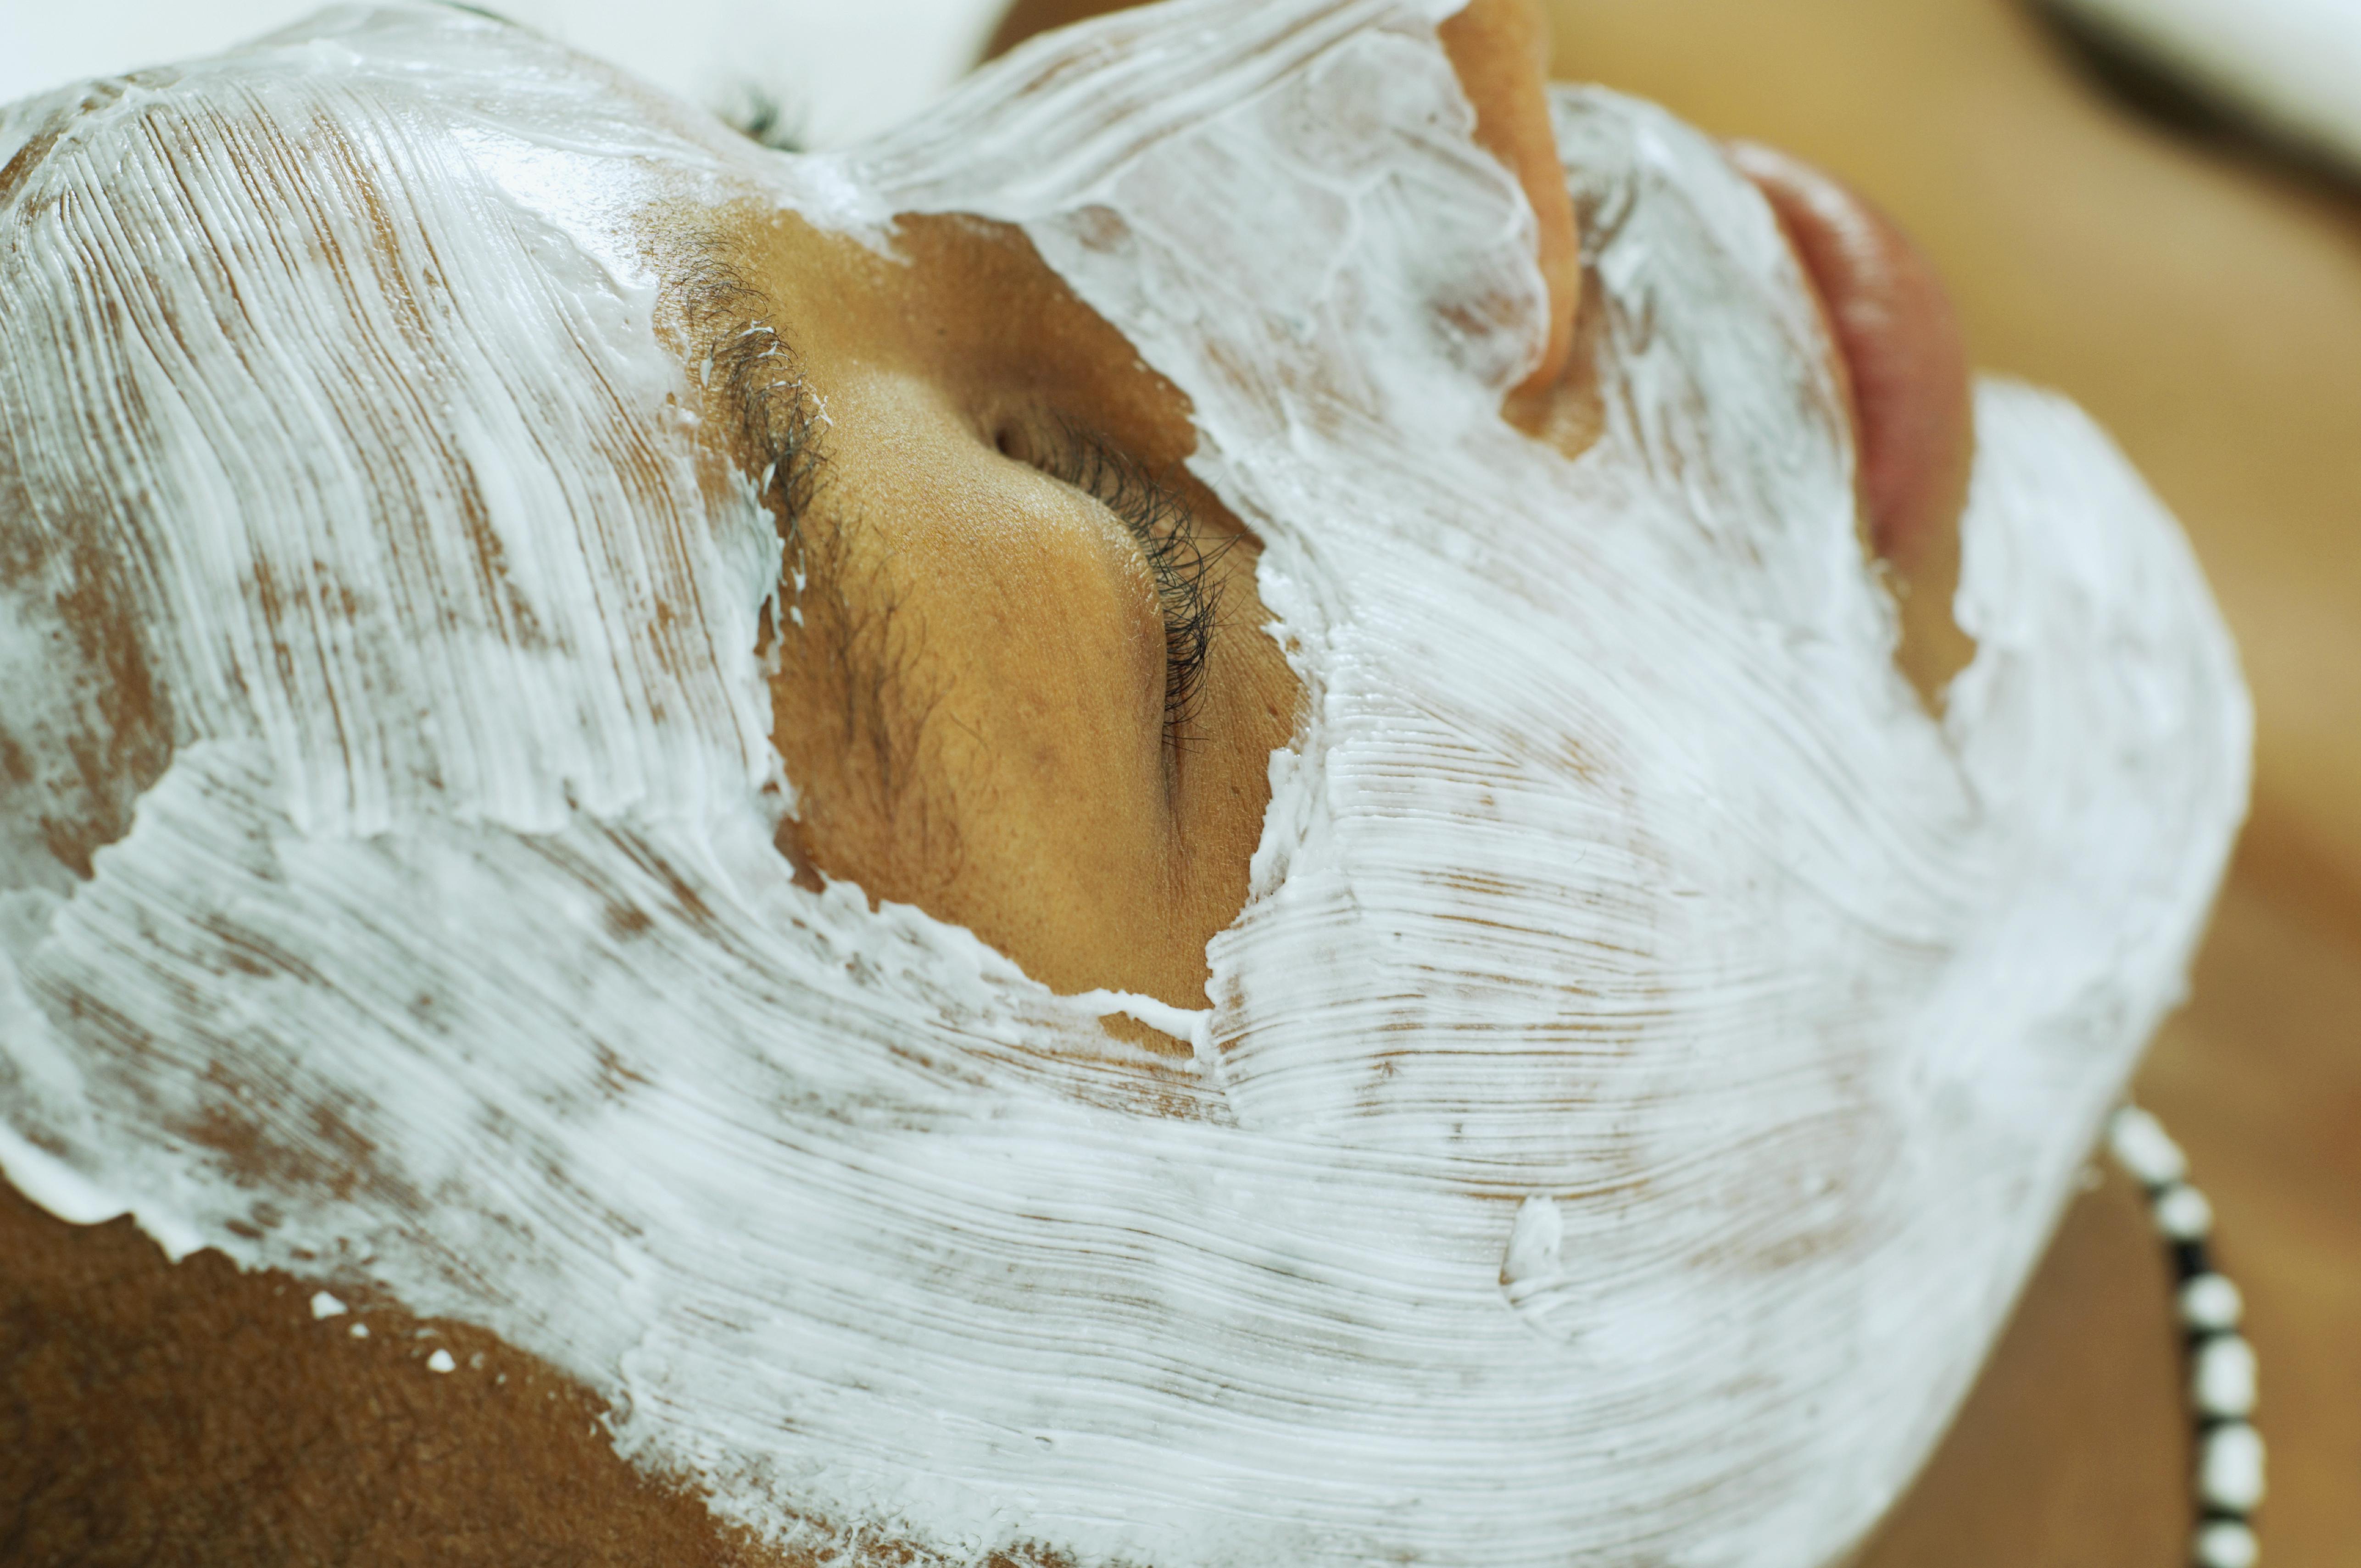 African man receiving spa facial treatment